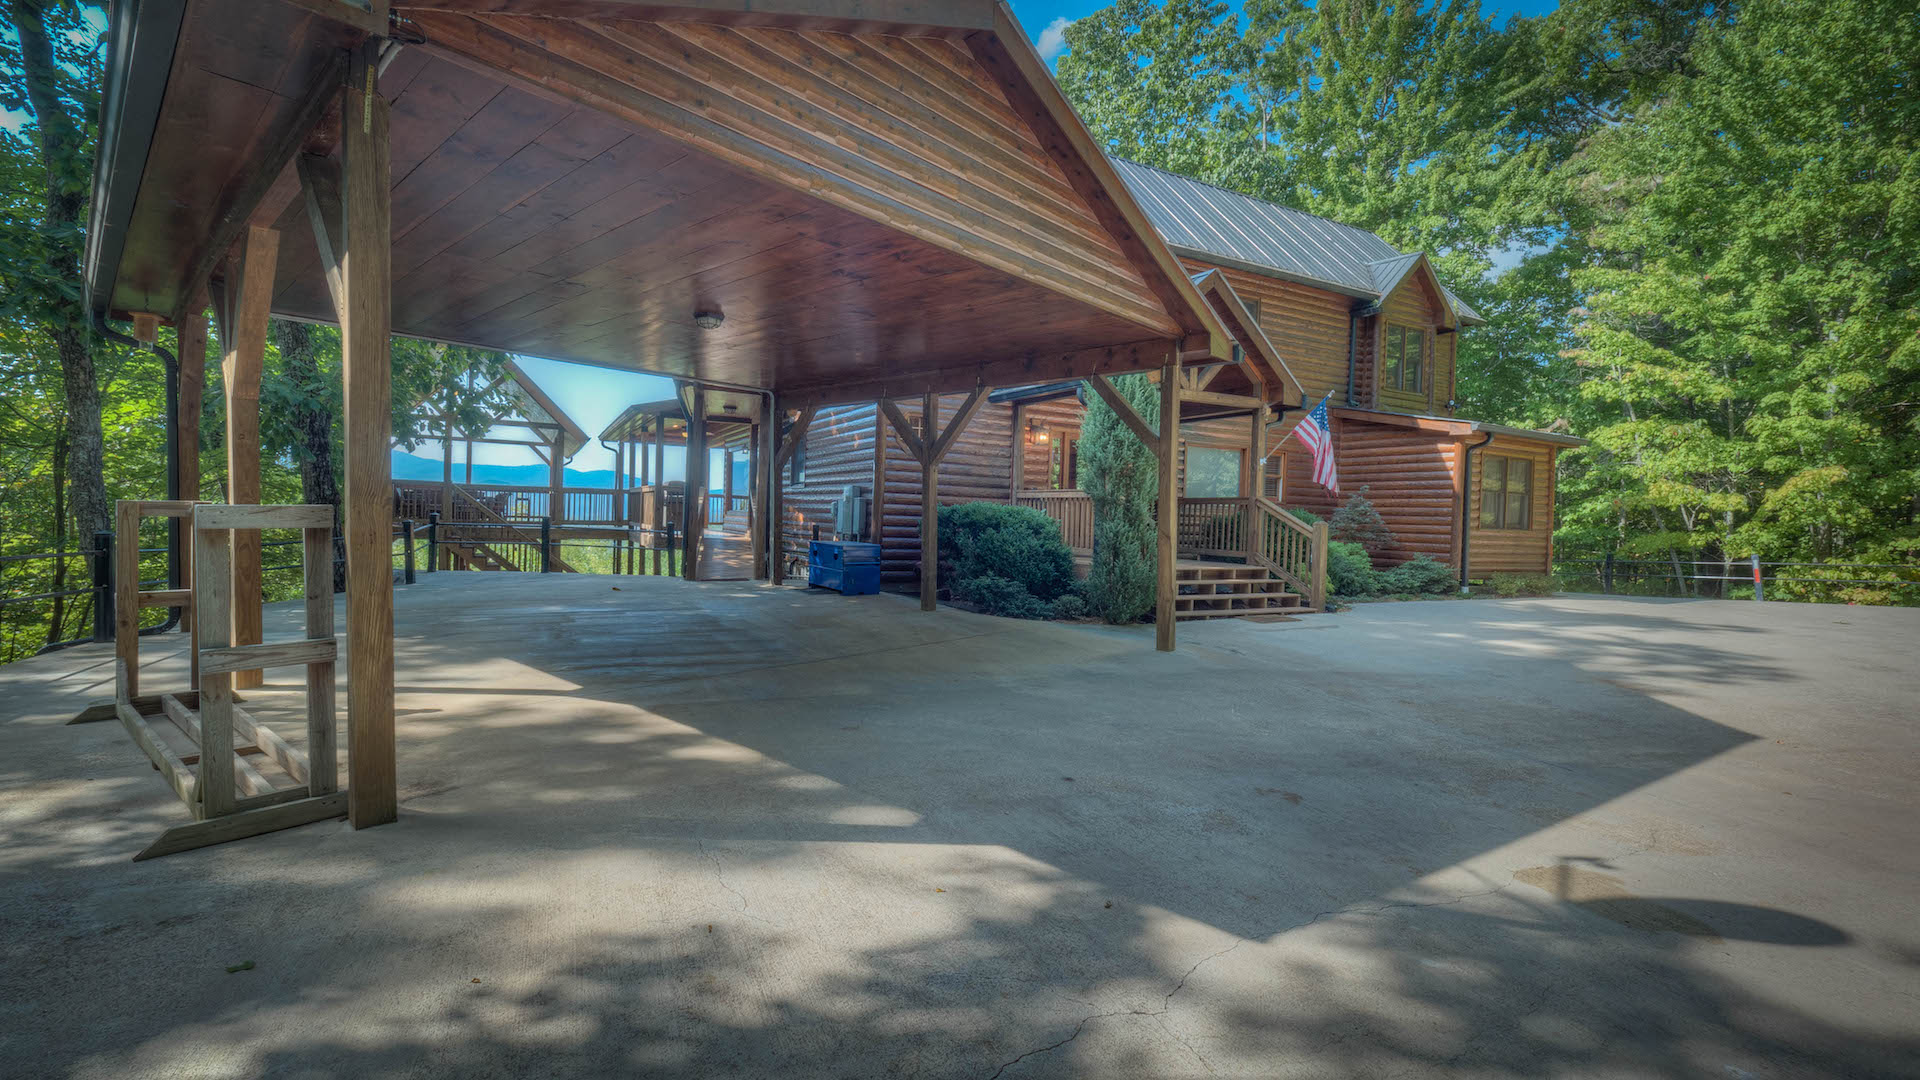 Southern komfort rental cabin blue ridge ga autos post for Blue ridge ga cabins for rent